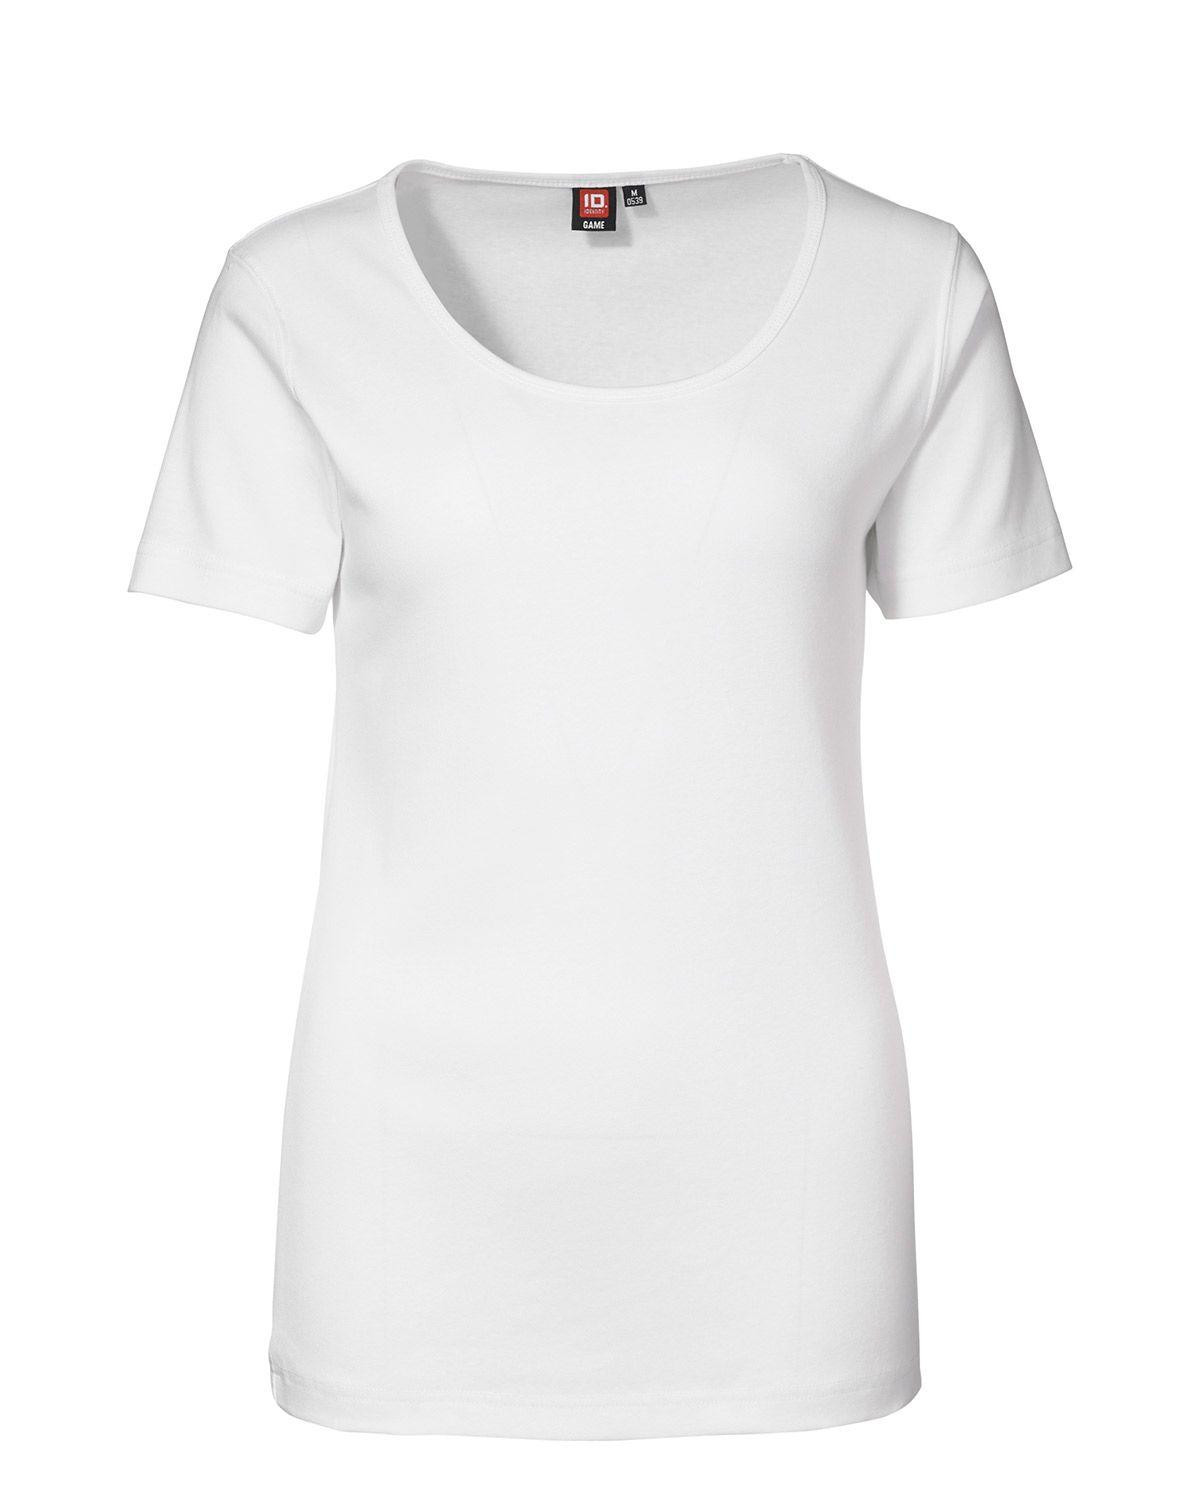 ID 1x1 rib T-shirt til Kvinder (Hvid, 2XL)